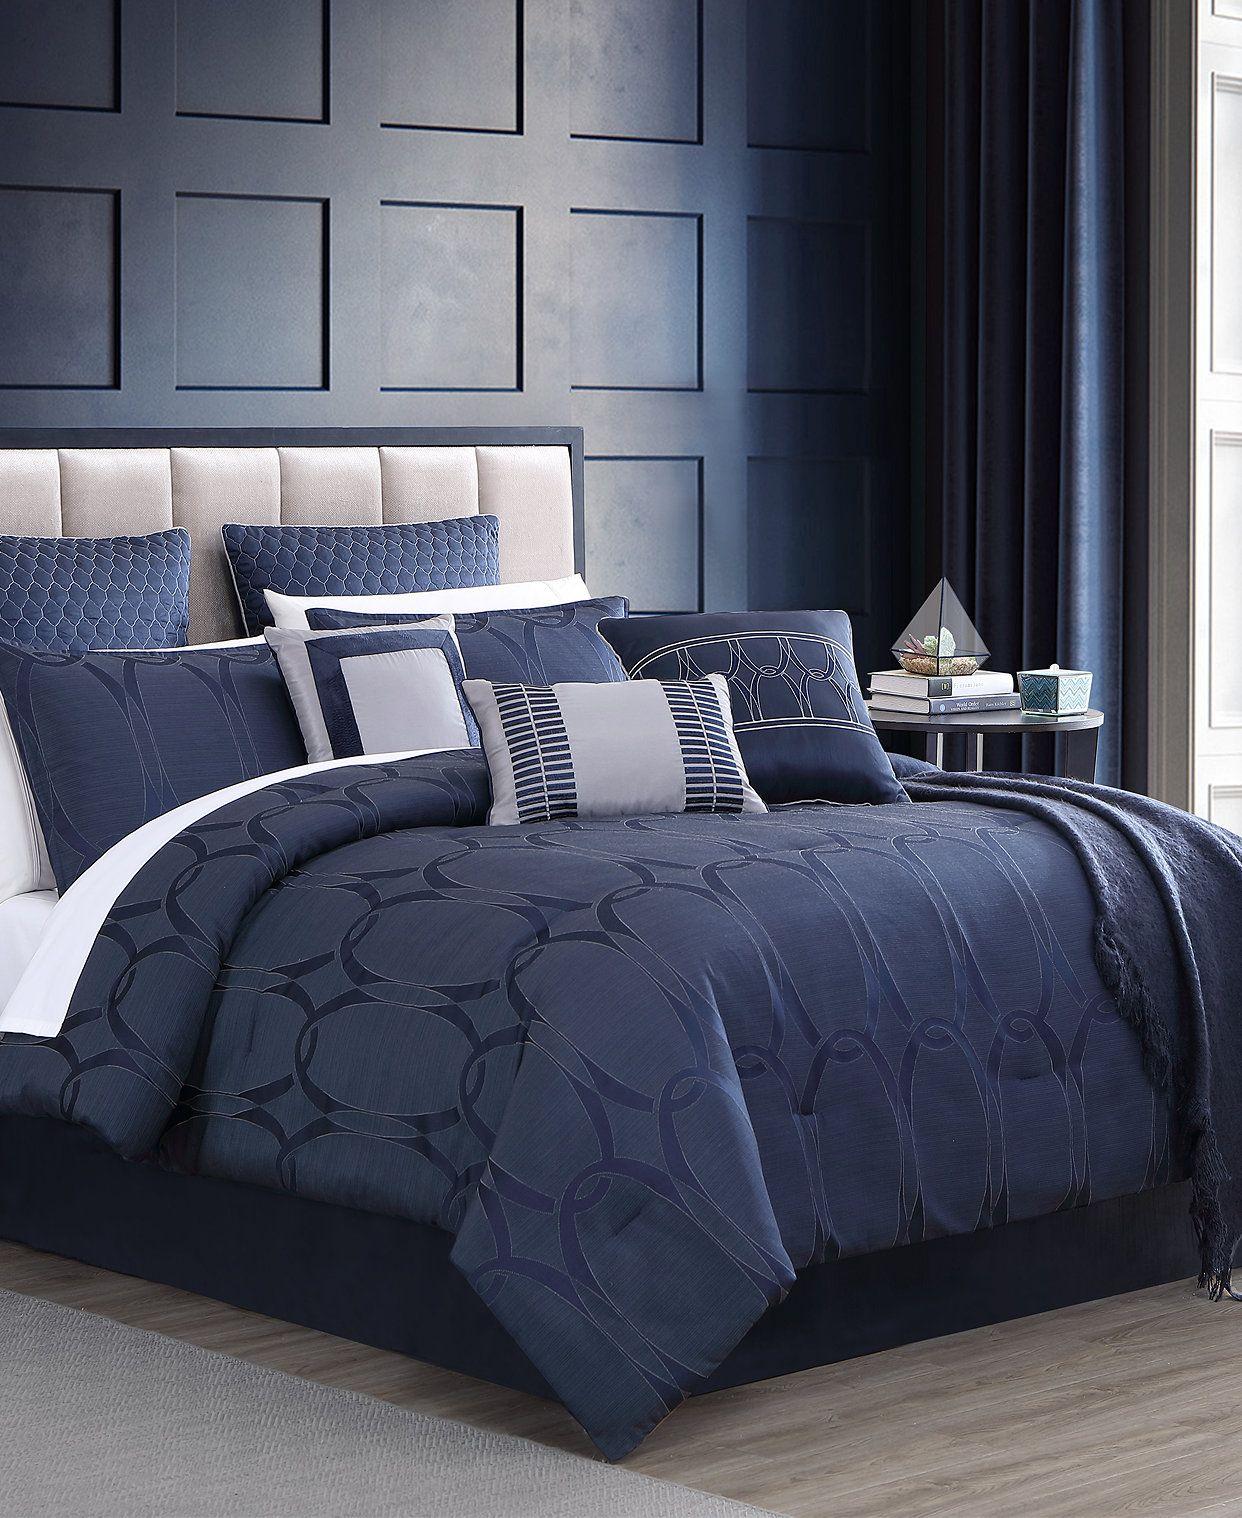 Hallmart Collectibles Closeout Danslo 14 Pc King Comforter Set Reviews Comforter Sets Bed Bath Macy S Comforter Sets King Comforter Sets Queen Comforter Sets